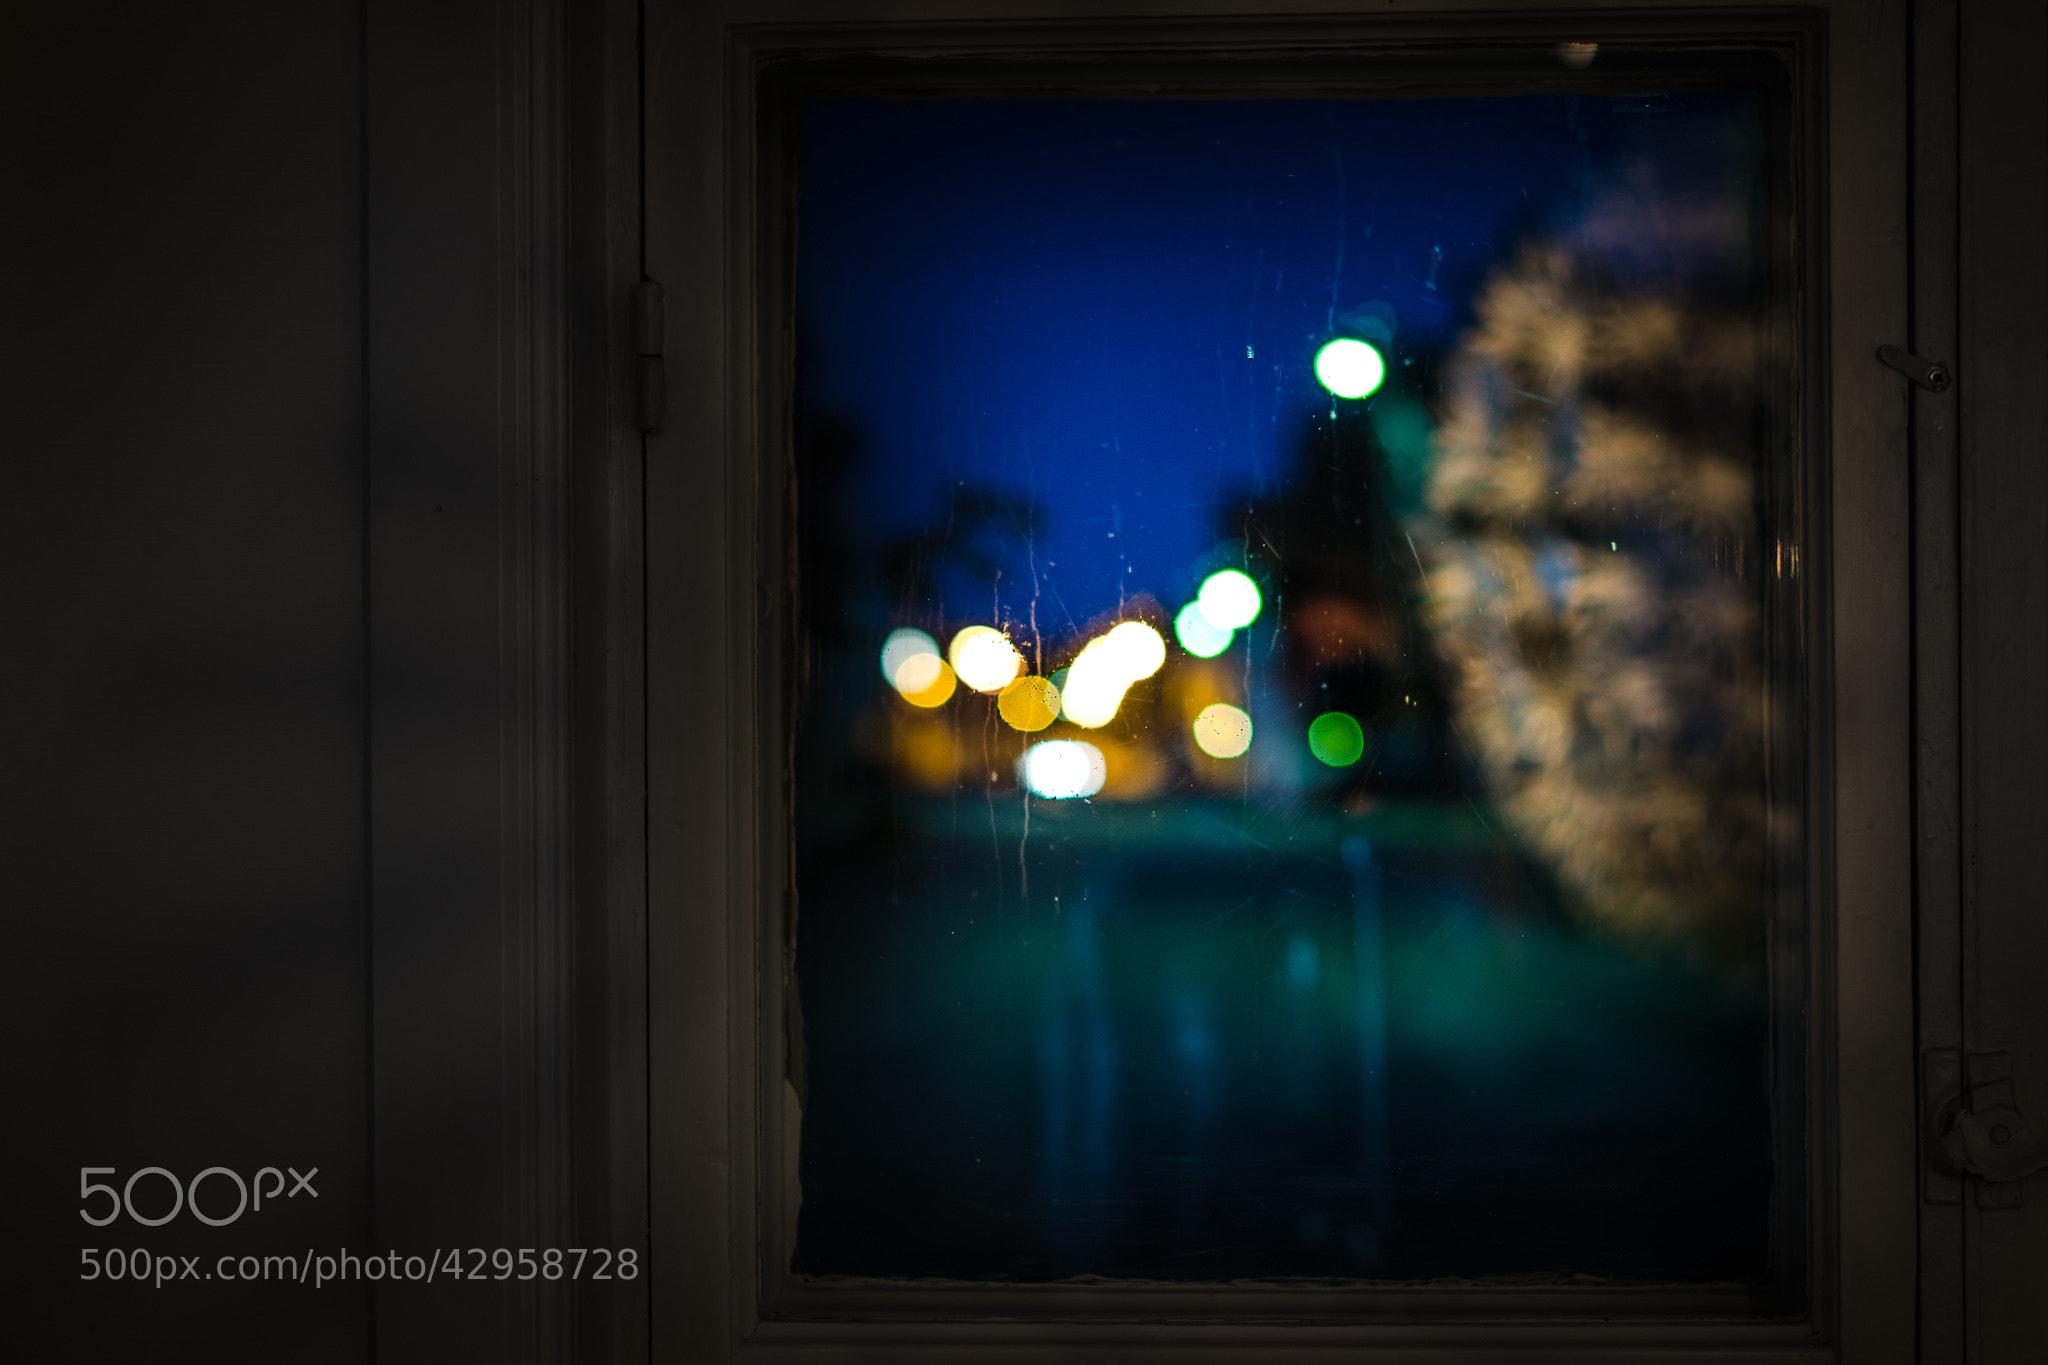 Photograph Sunday window by Ulf Bjolin on 500px